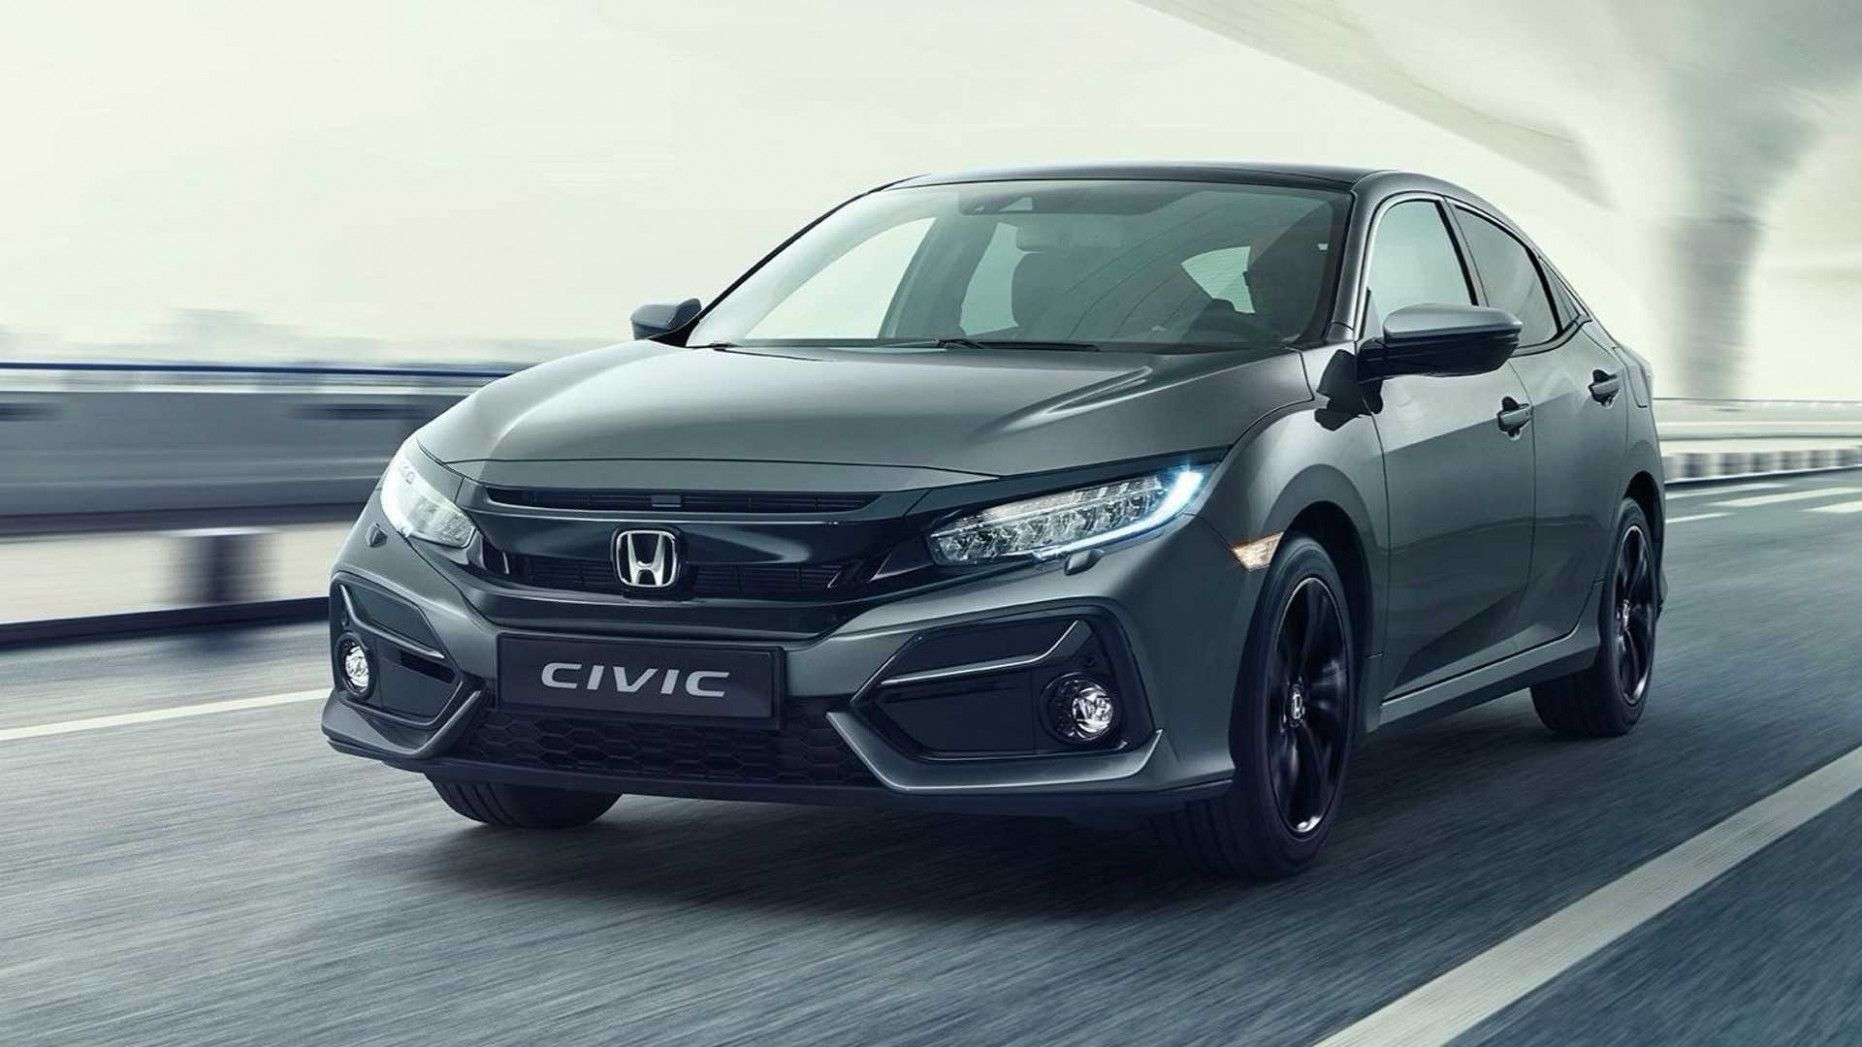 Honda civic photography ideas [19 in 2020 Honda civic